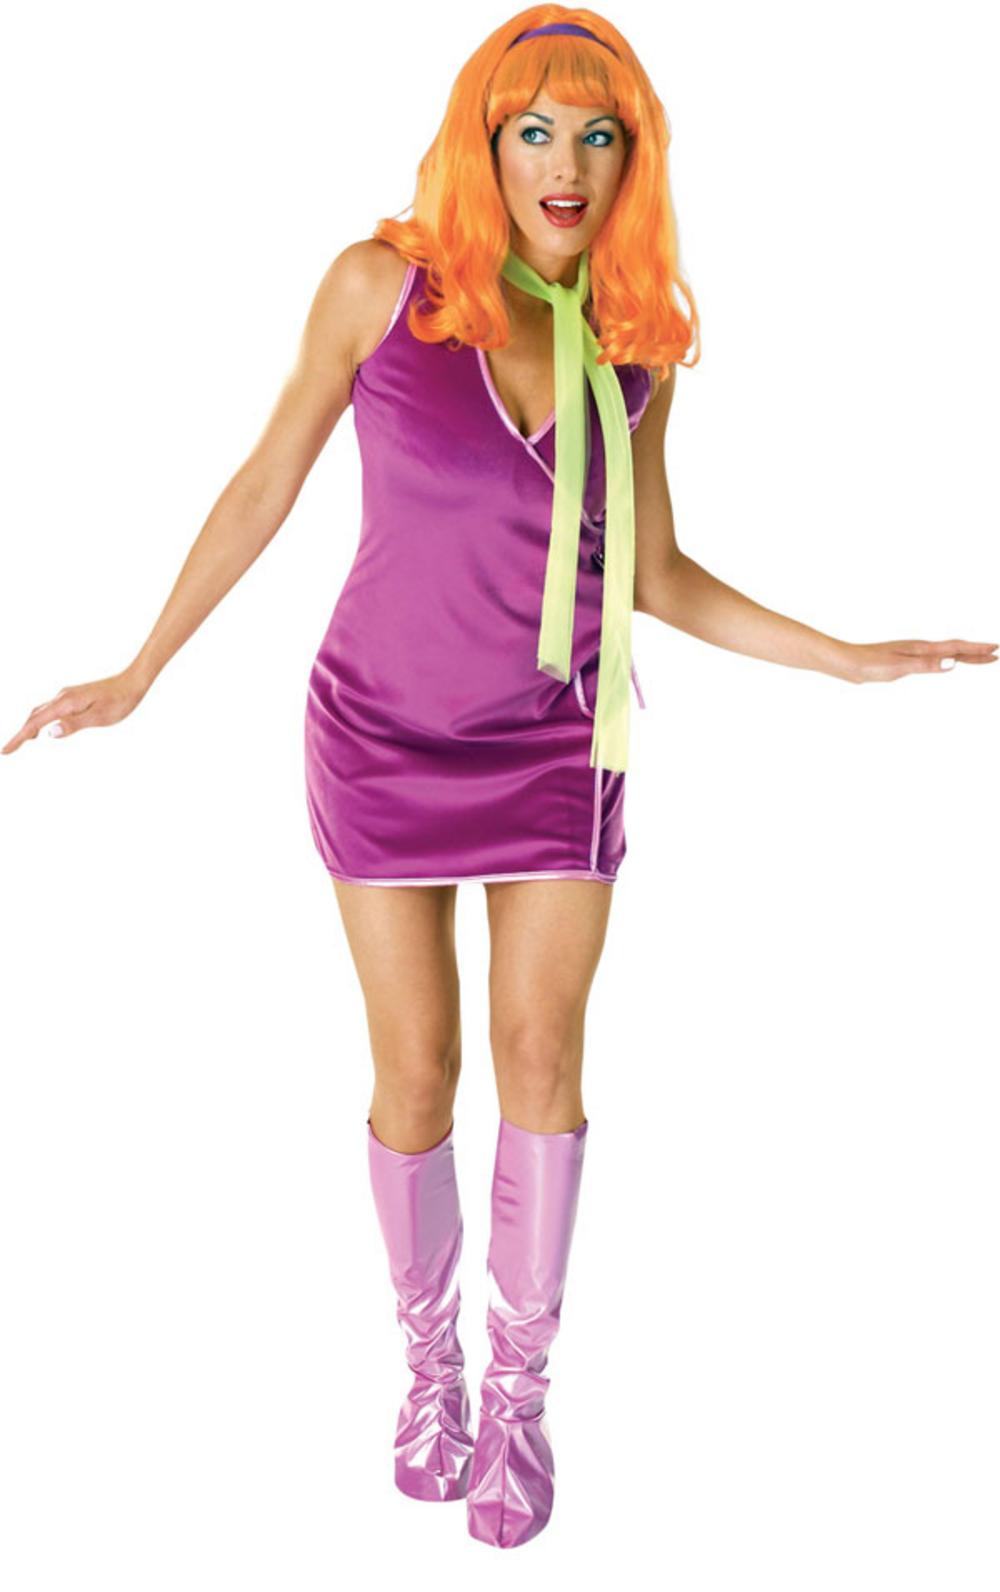 Daphne Scooby Doo Costume & wig